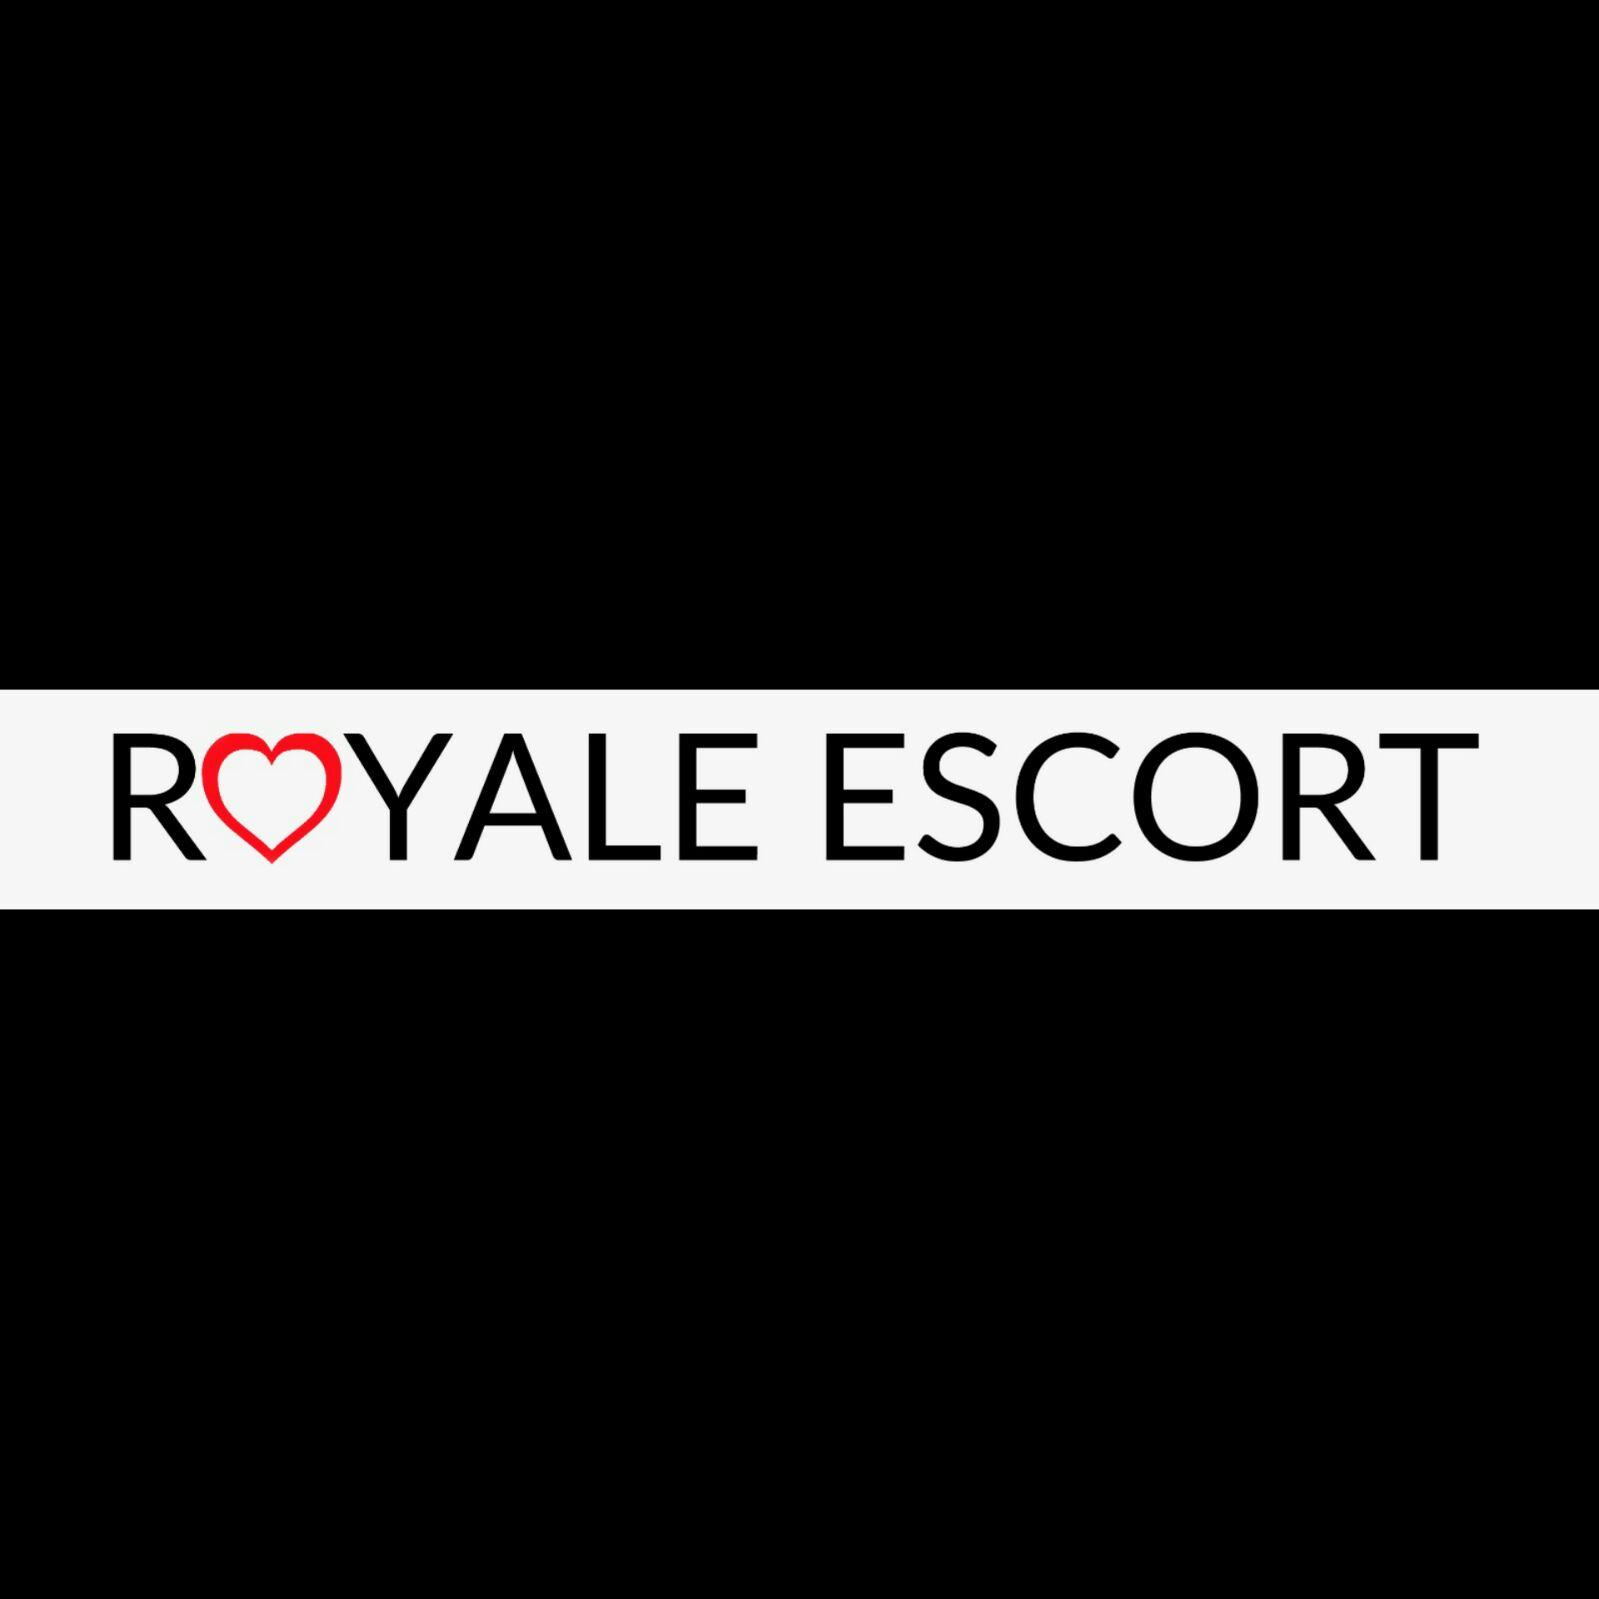 Royale Escort